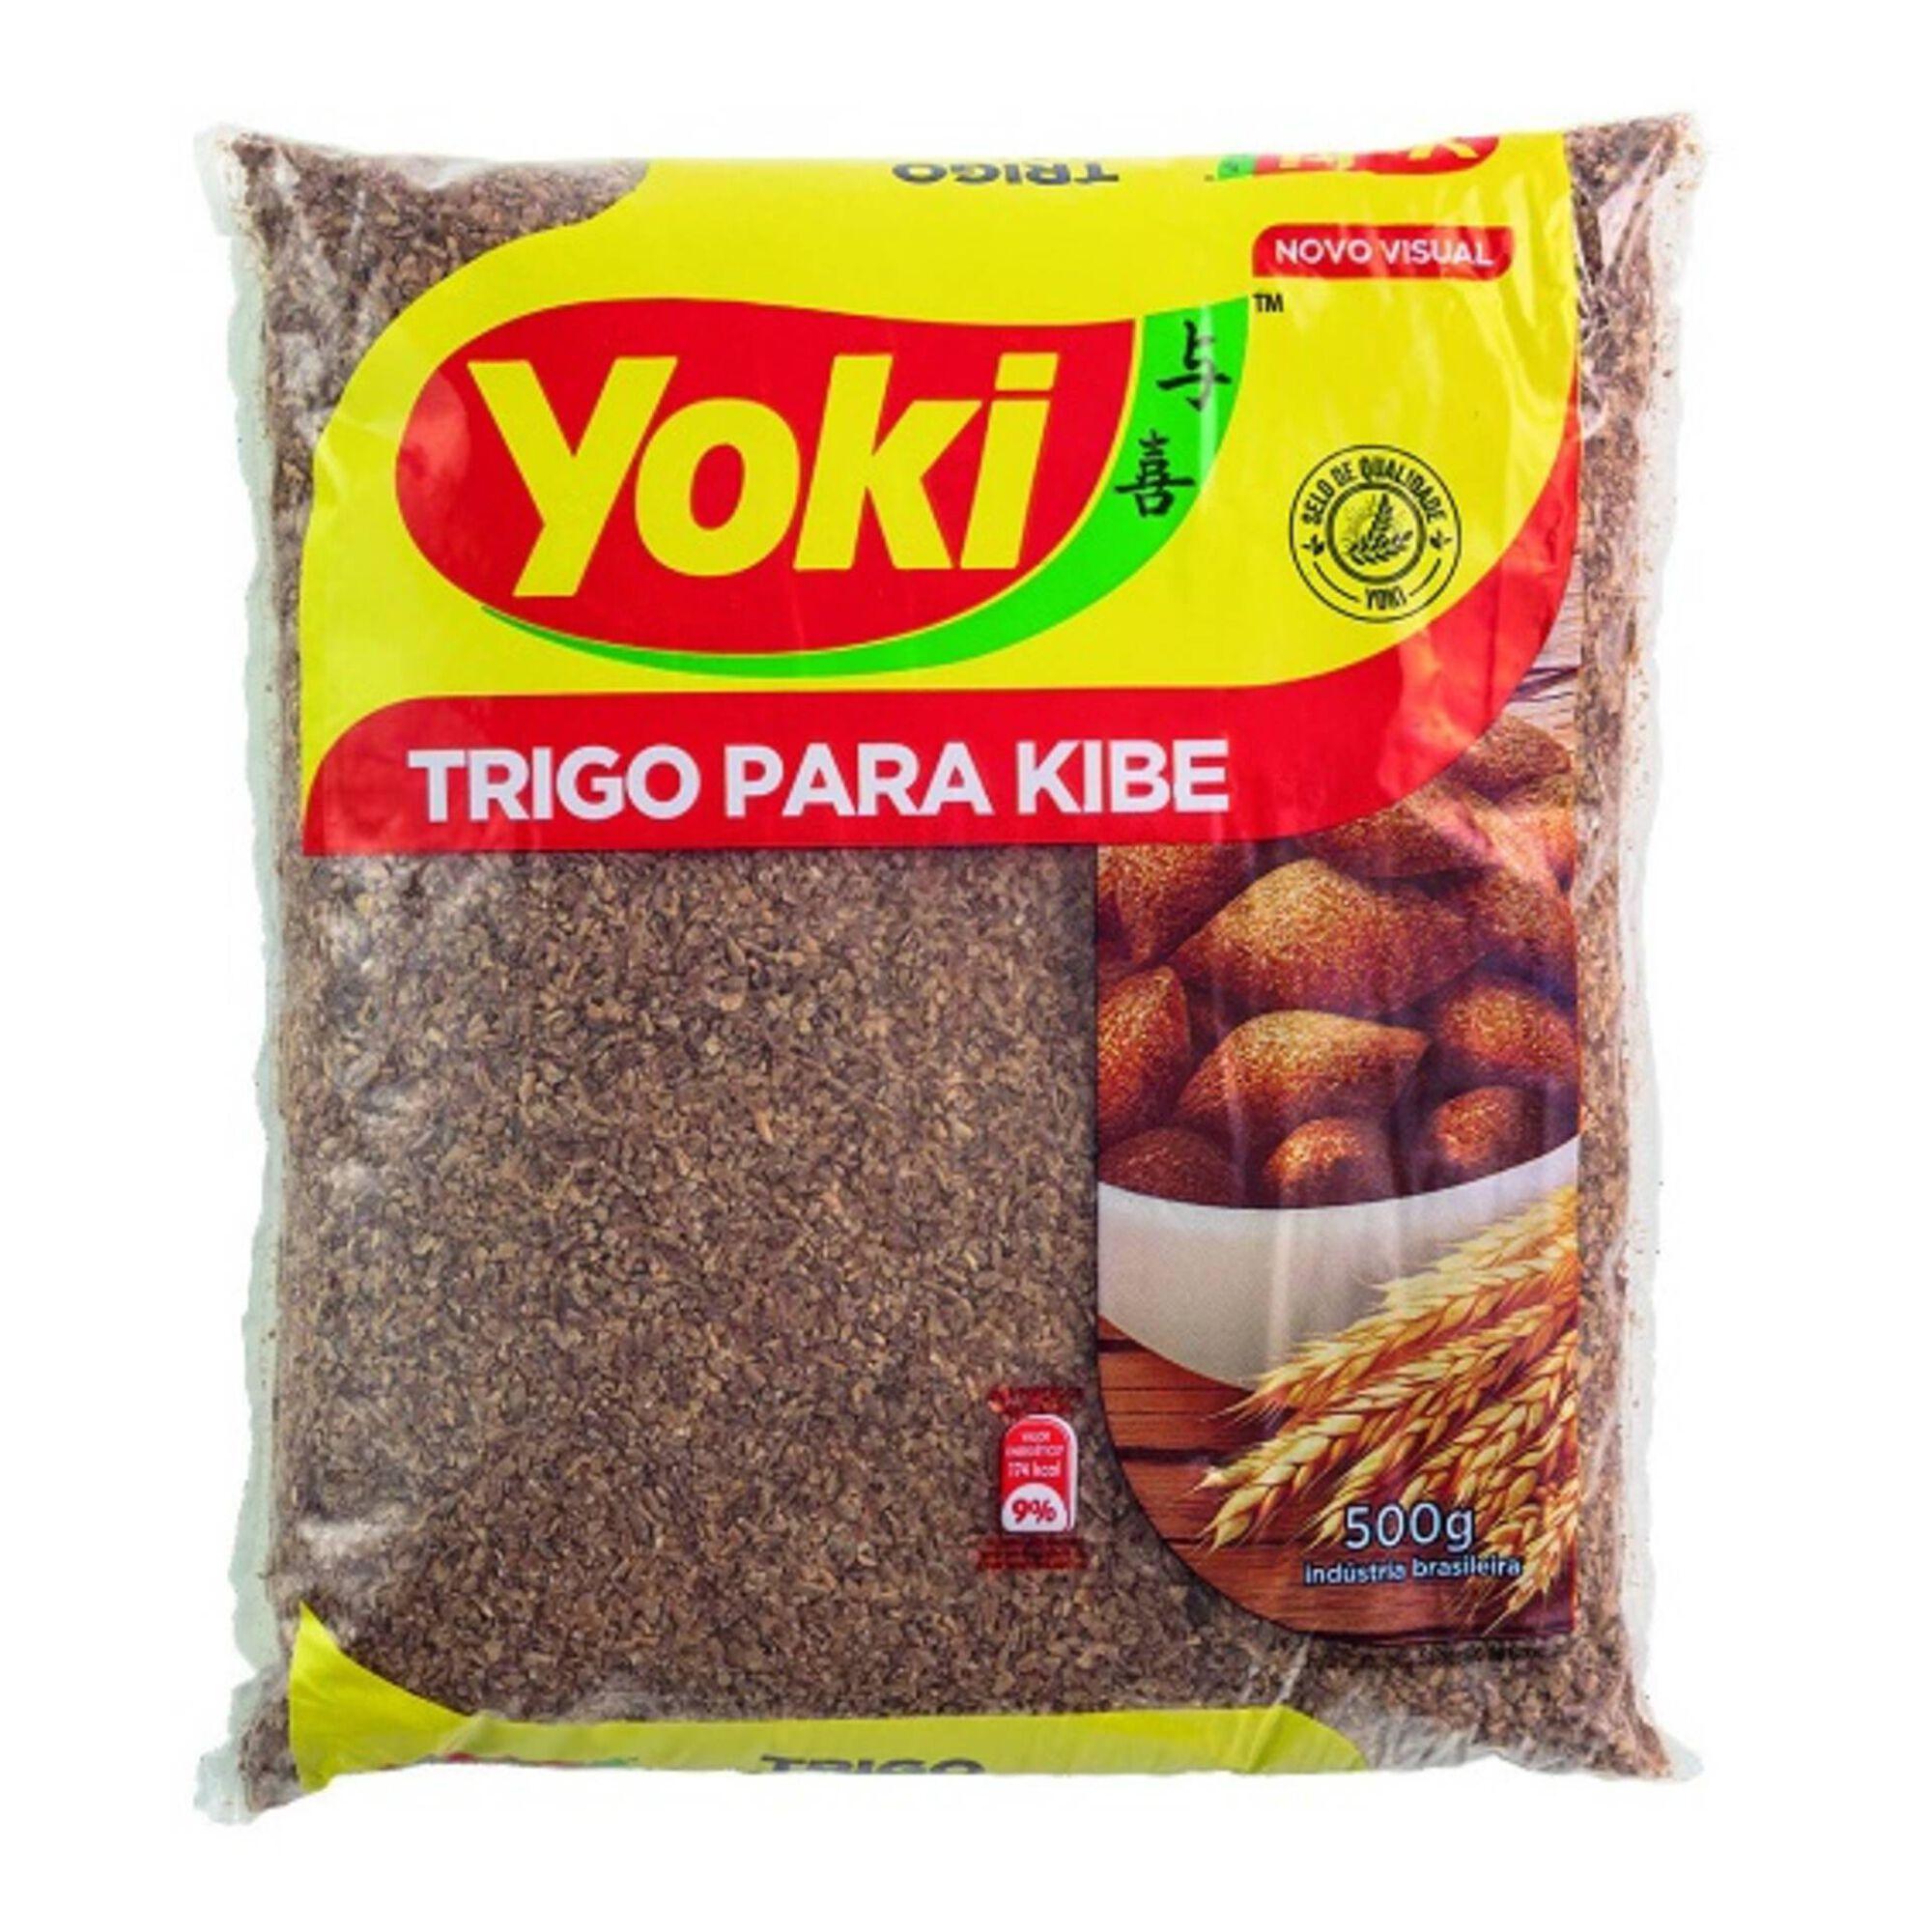 Farinha de Trigo para Kibe